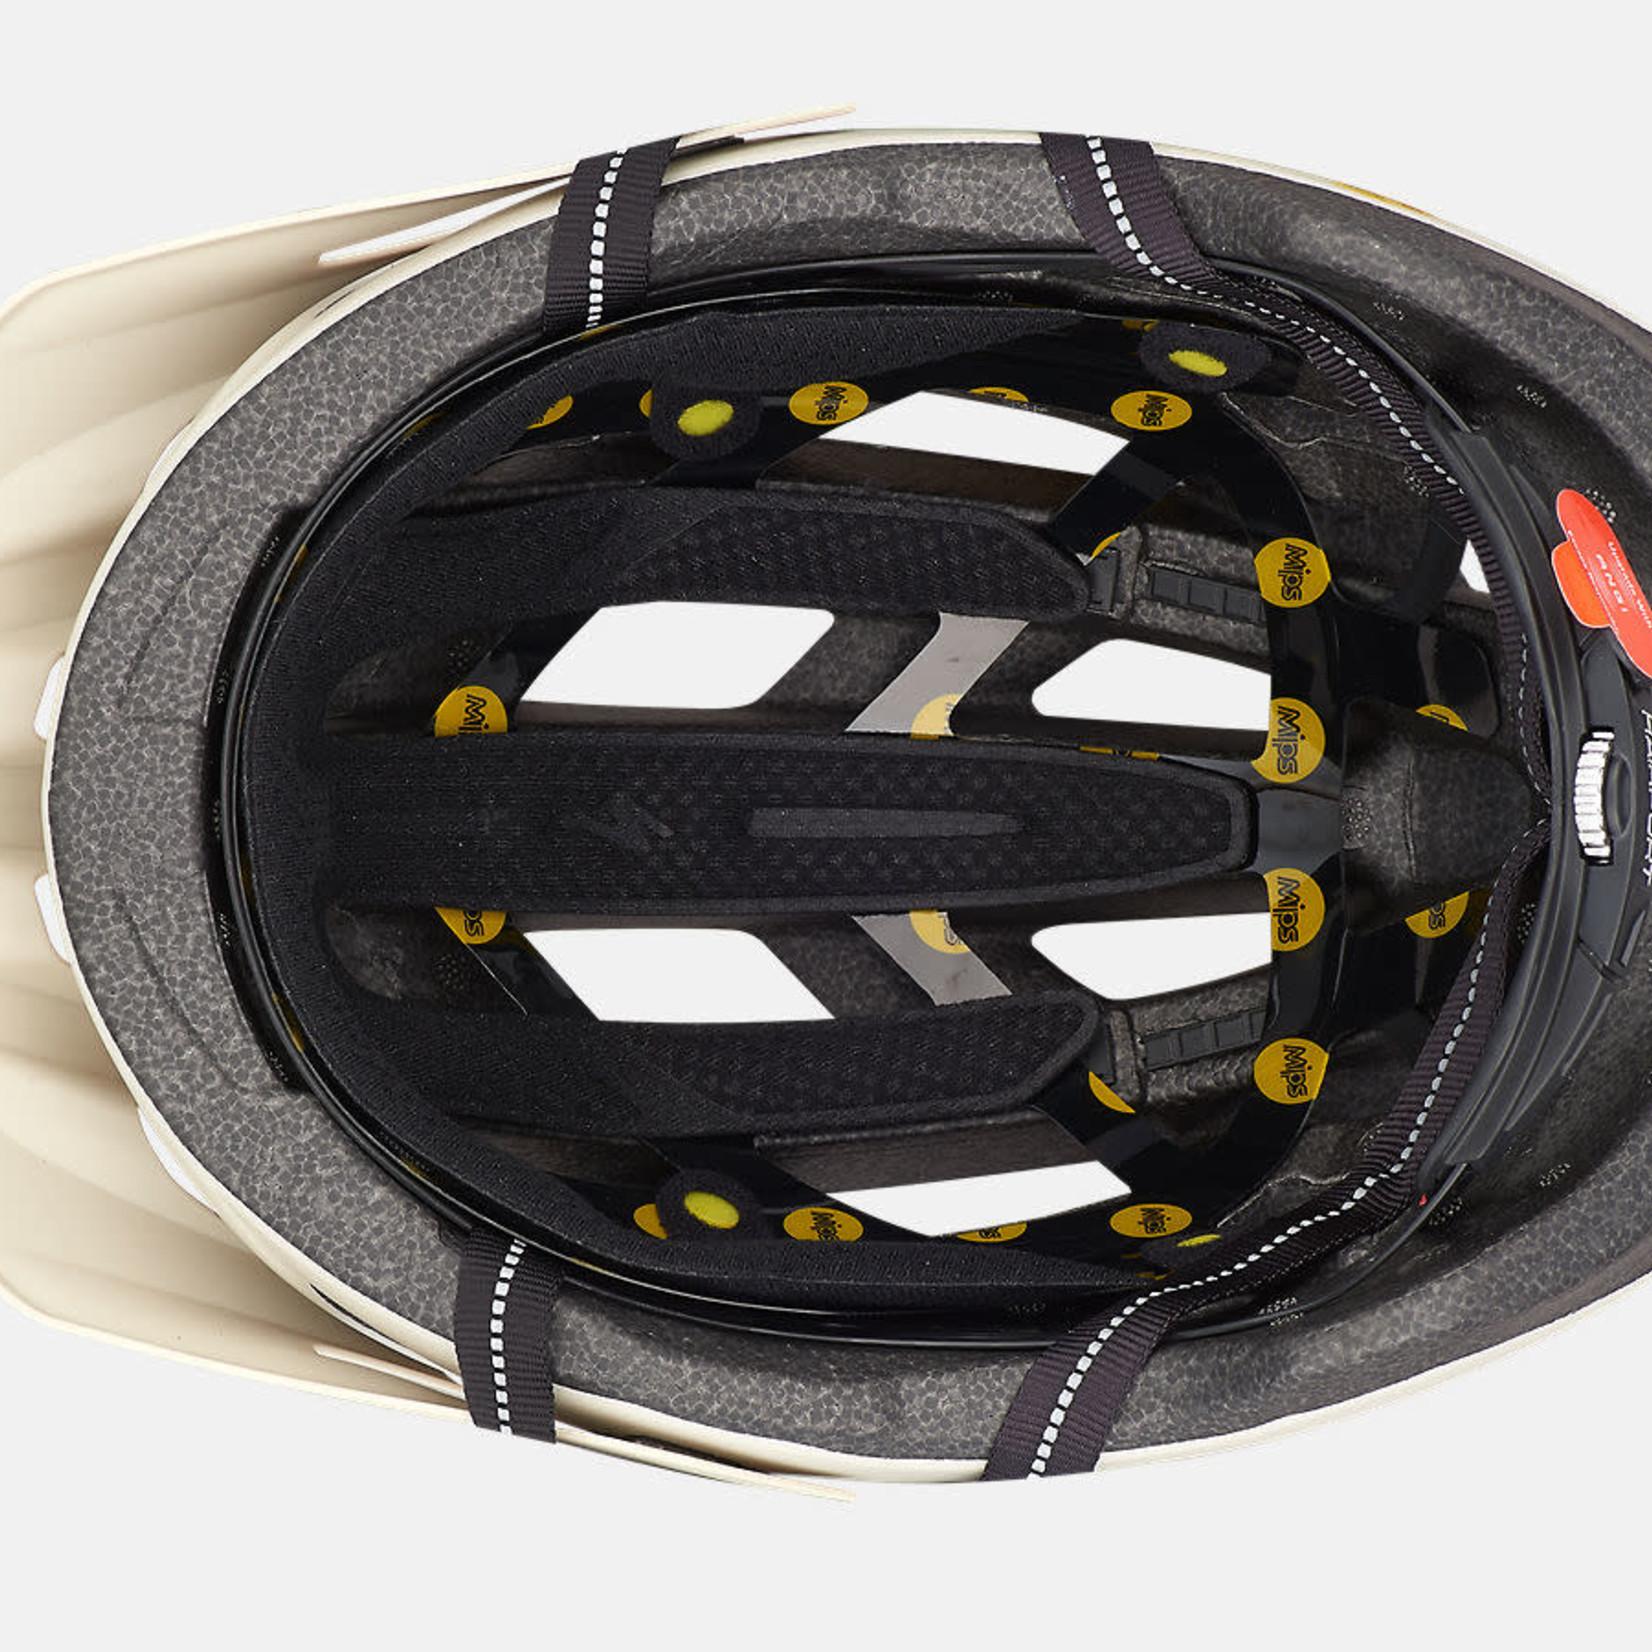 SPECIALIZED Specialized Tactic 3 Mips Helmet Matt Black